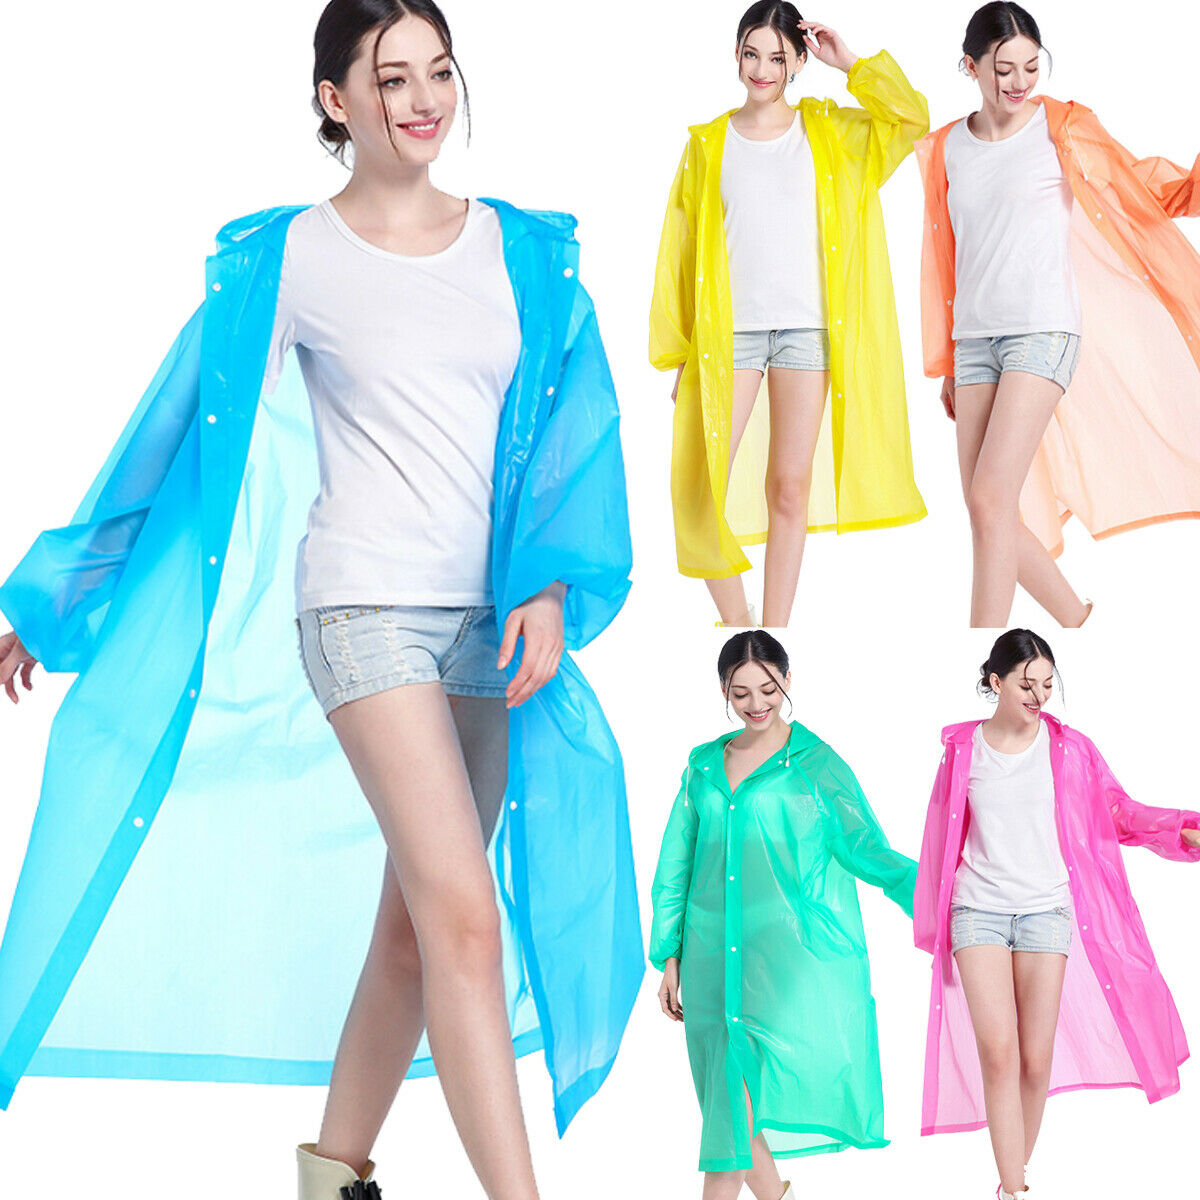 Nuevo sólido transparente lluvia EVA portátil mujeres chicas botón señora Up Coat Chic impermeable con capucha chaqueta impermeable